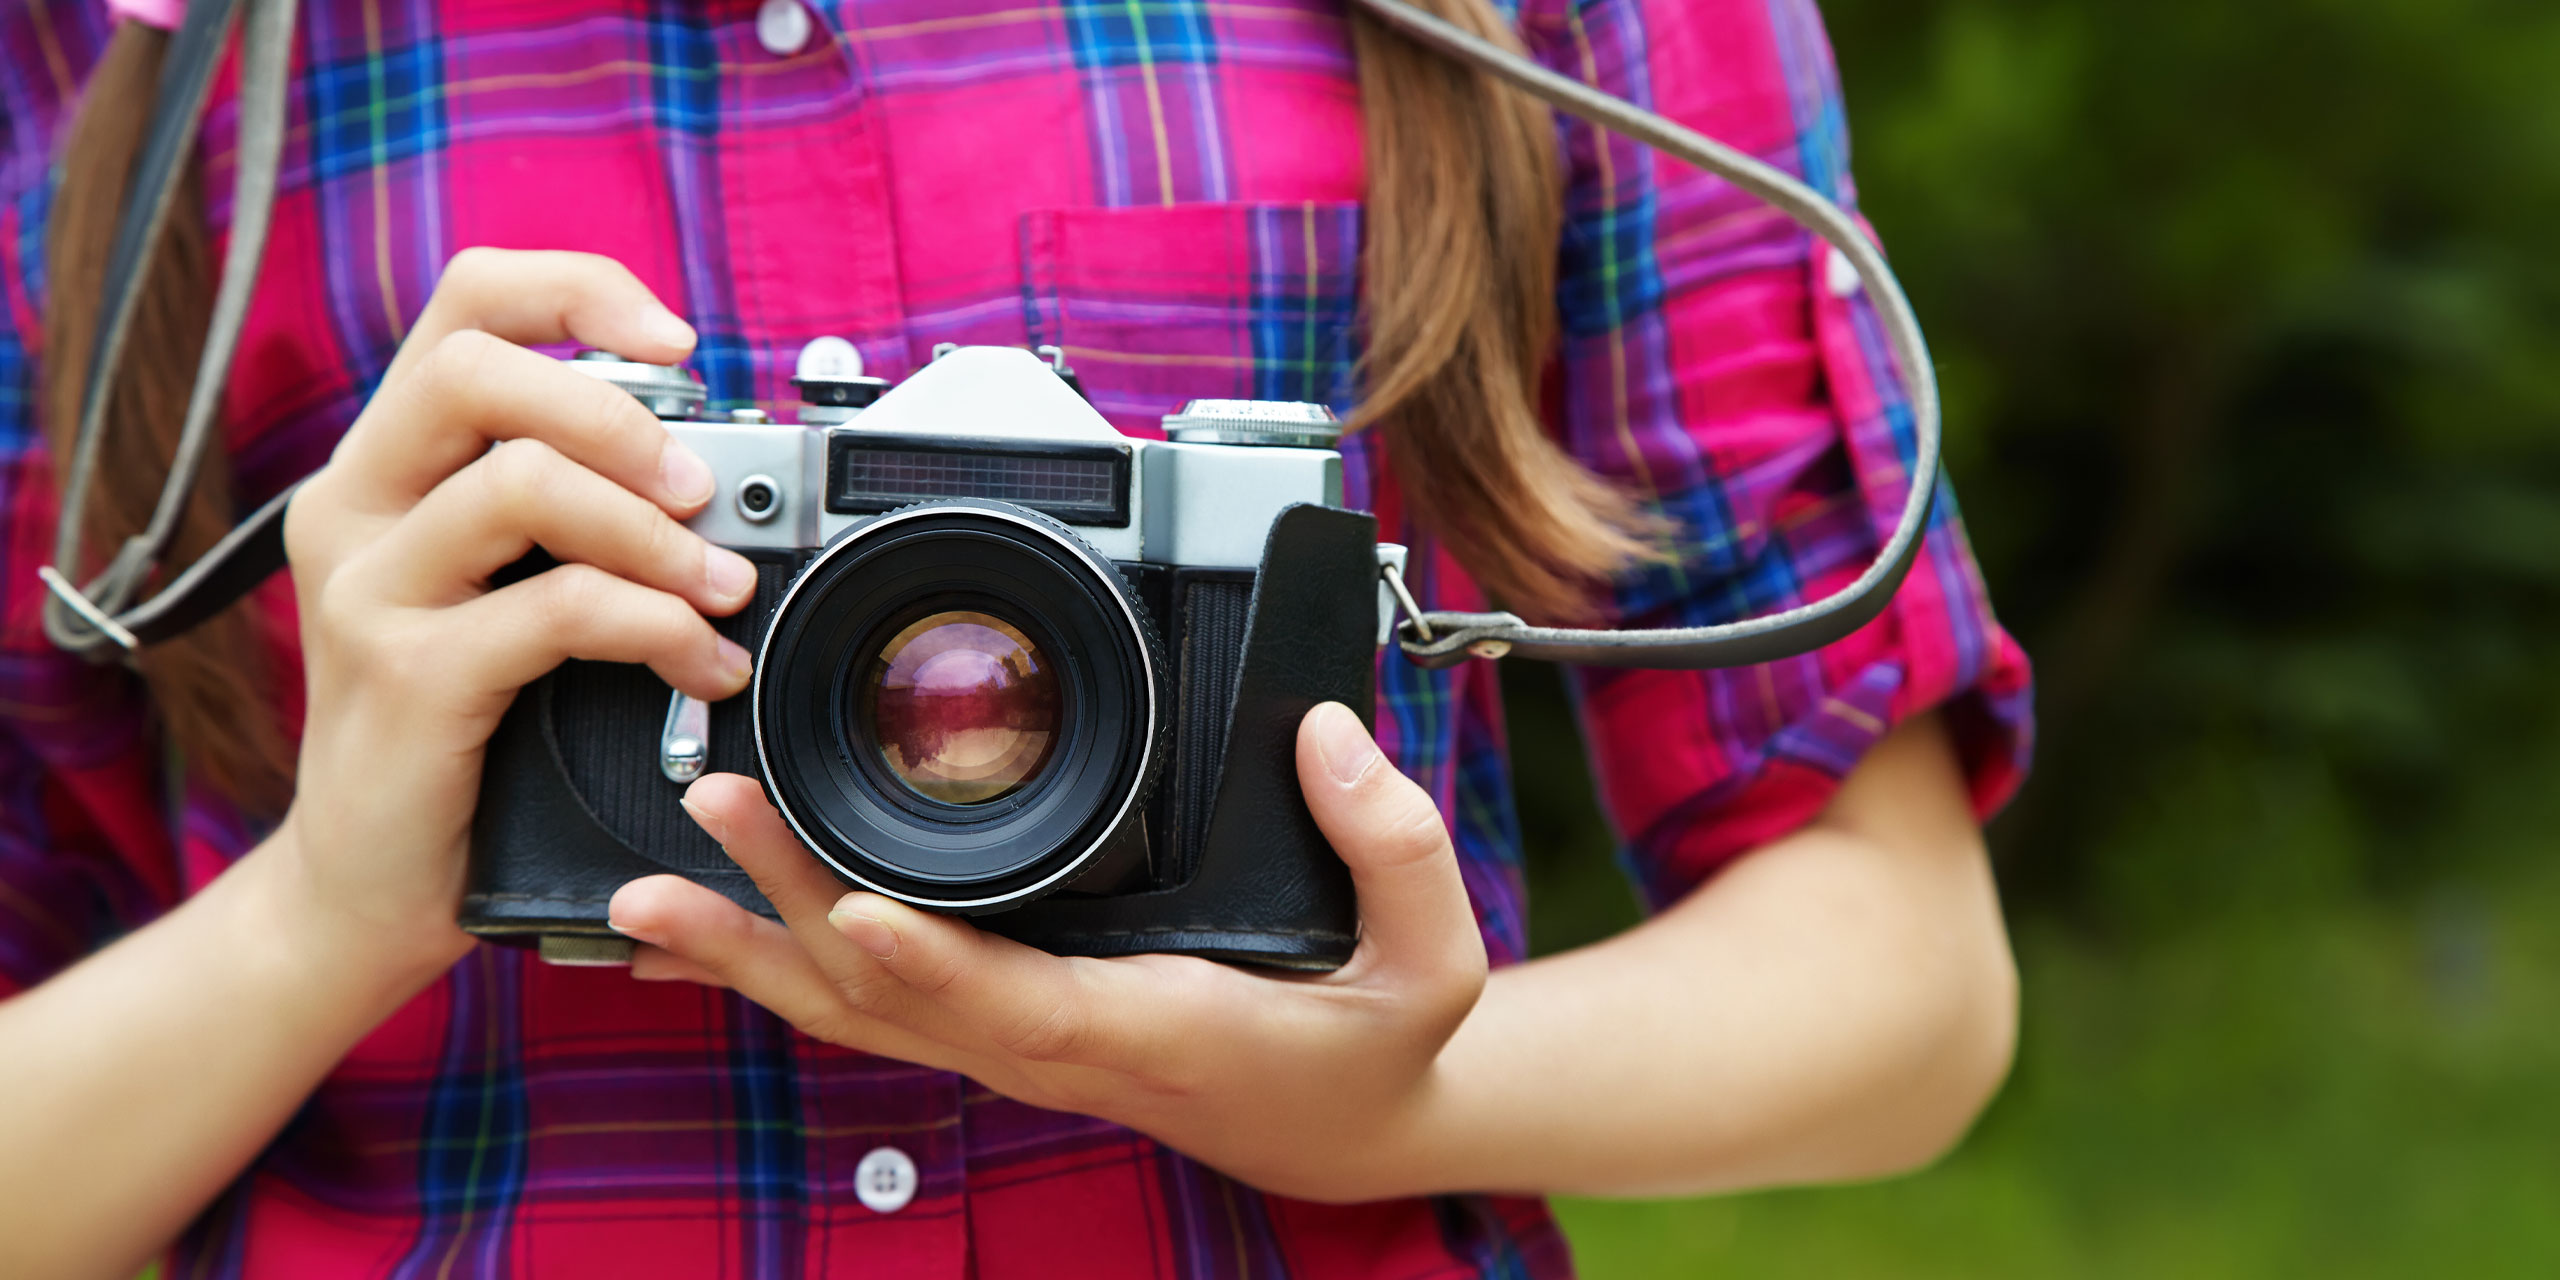 Girl with a Camera; Courtesy of Evgeny Bakharev/Shutterstock.com